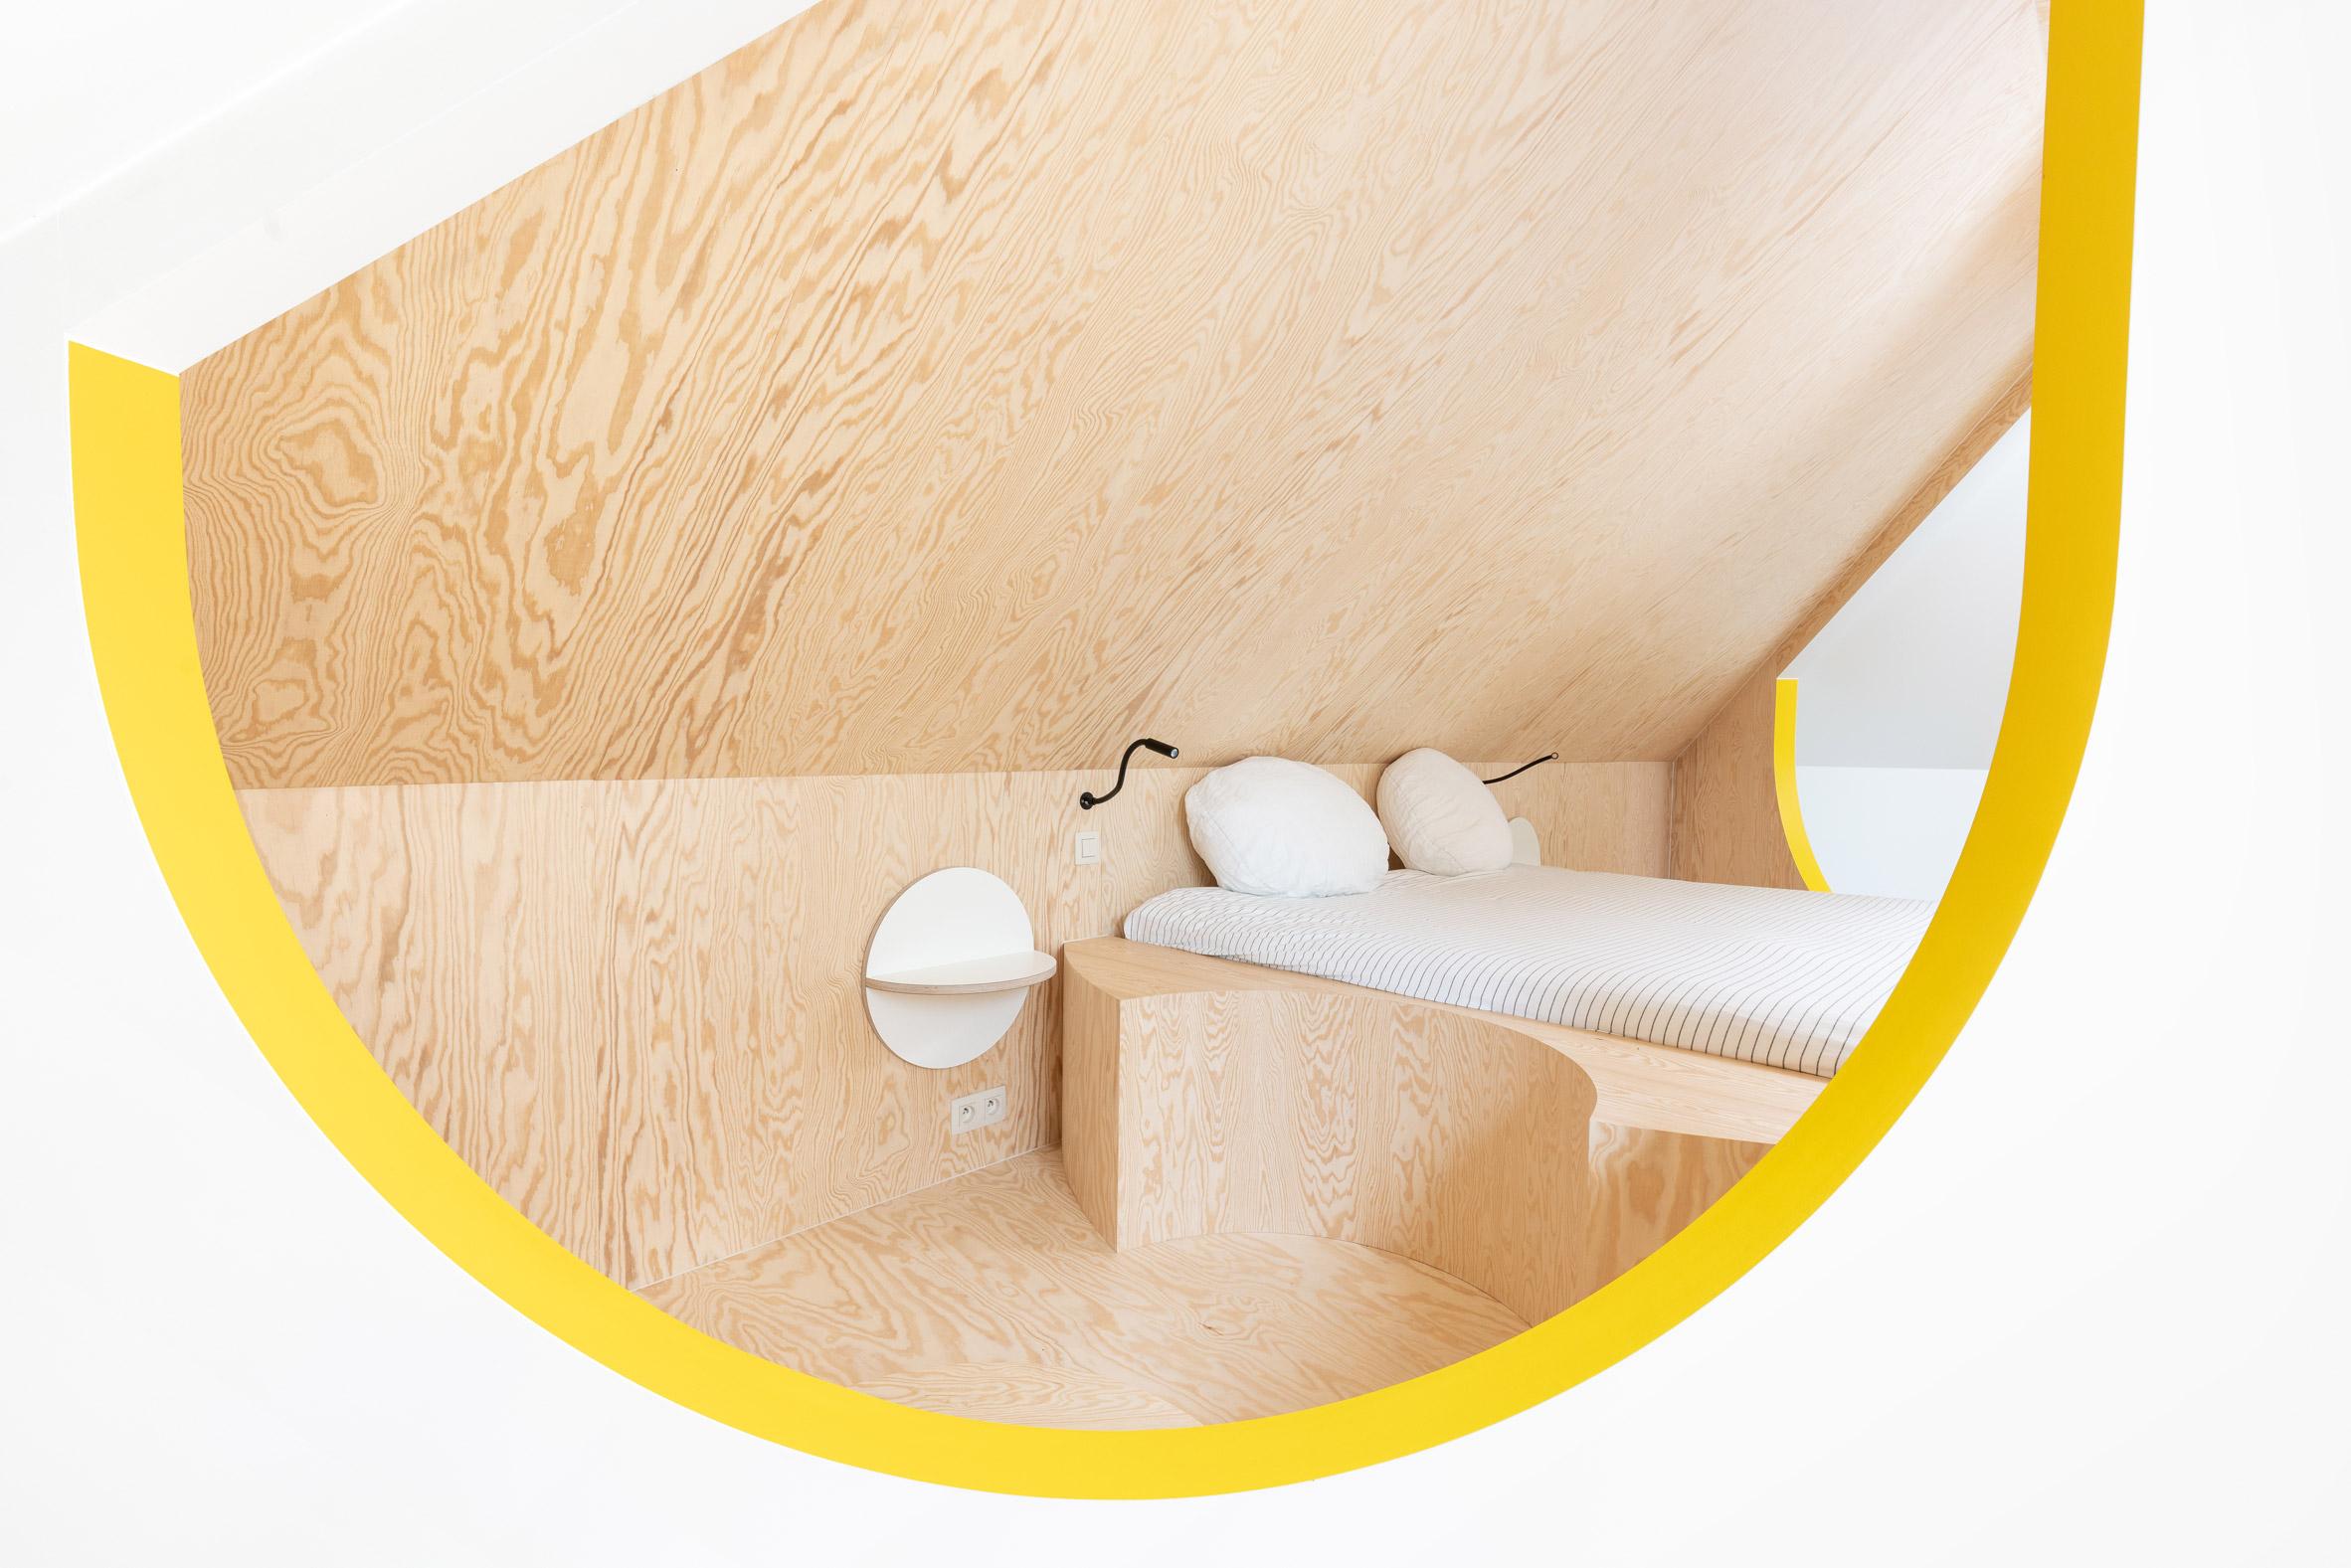 Attic conversion by Van Staeyen Interieur Architecten